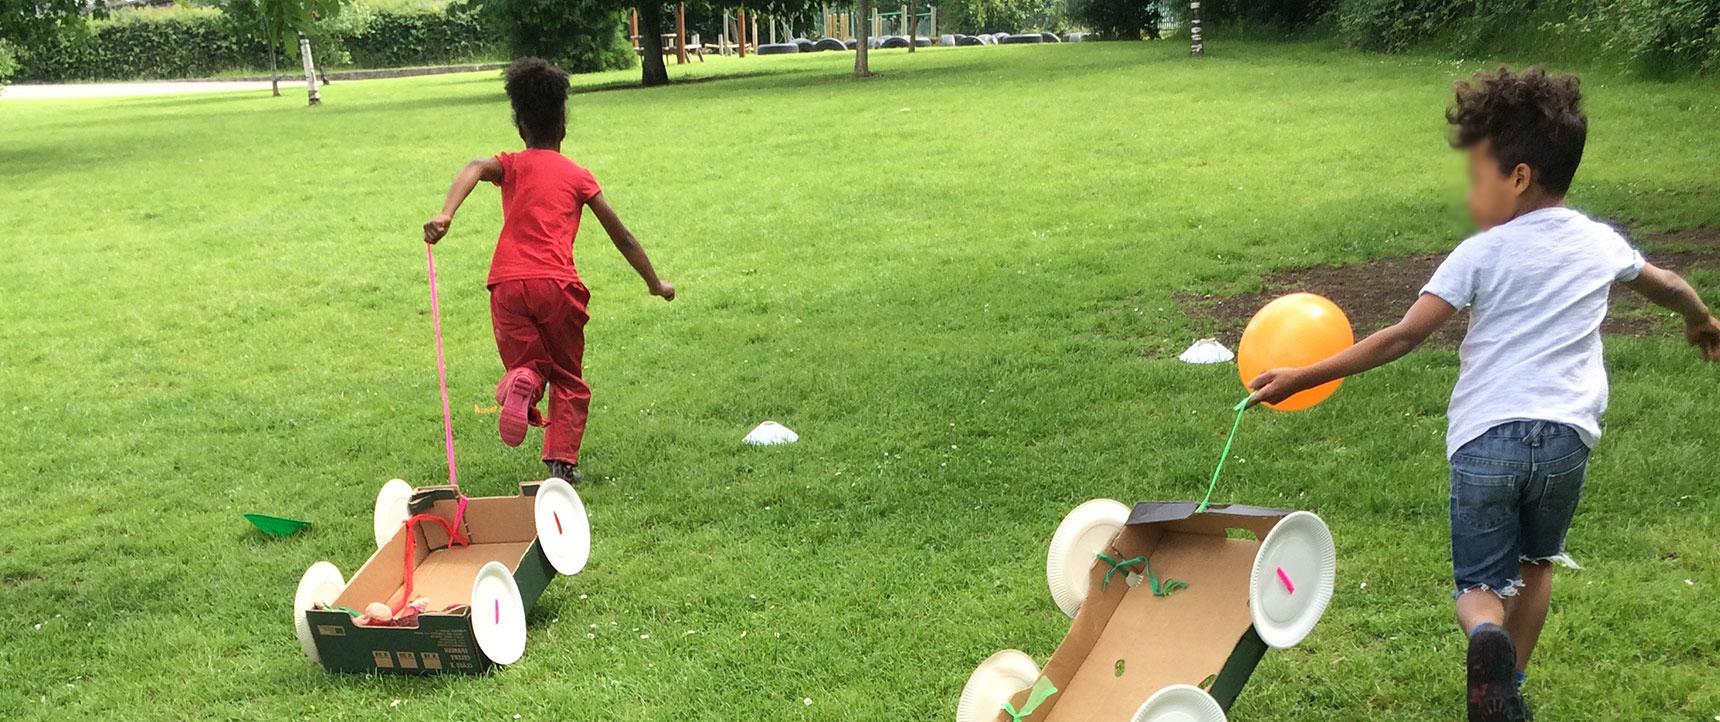 Play Nurture | Play Gloucestershire